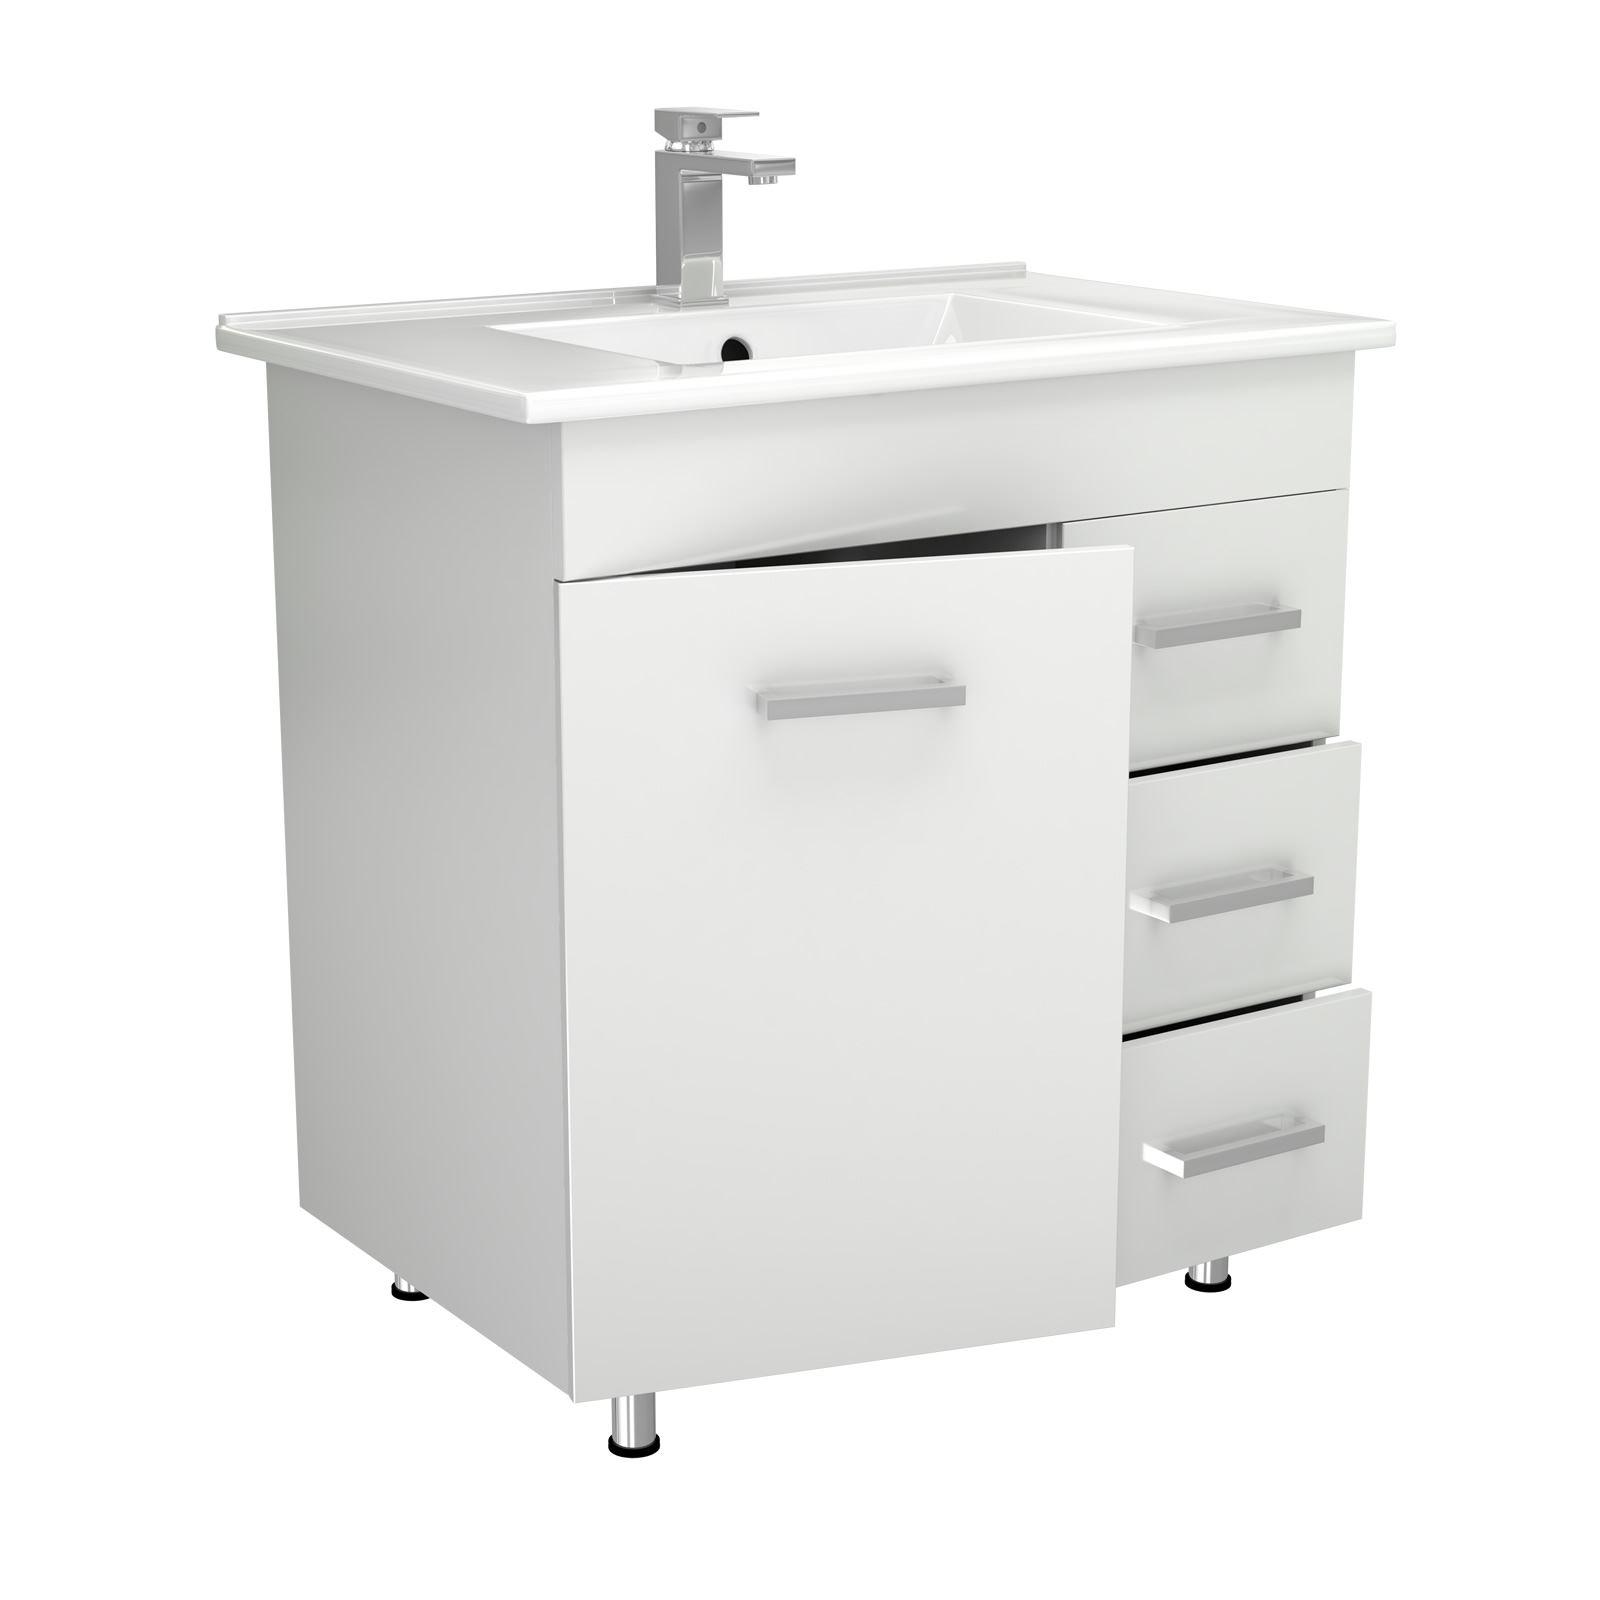 New Quartet Designer High Gloss Grey Bathroom Furniture  Square Closed